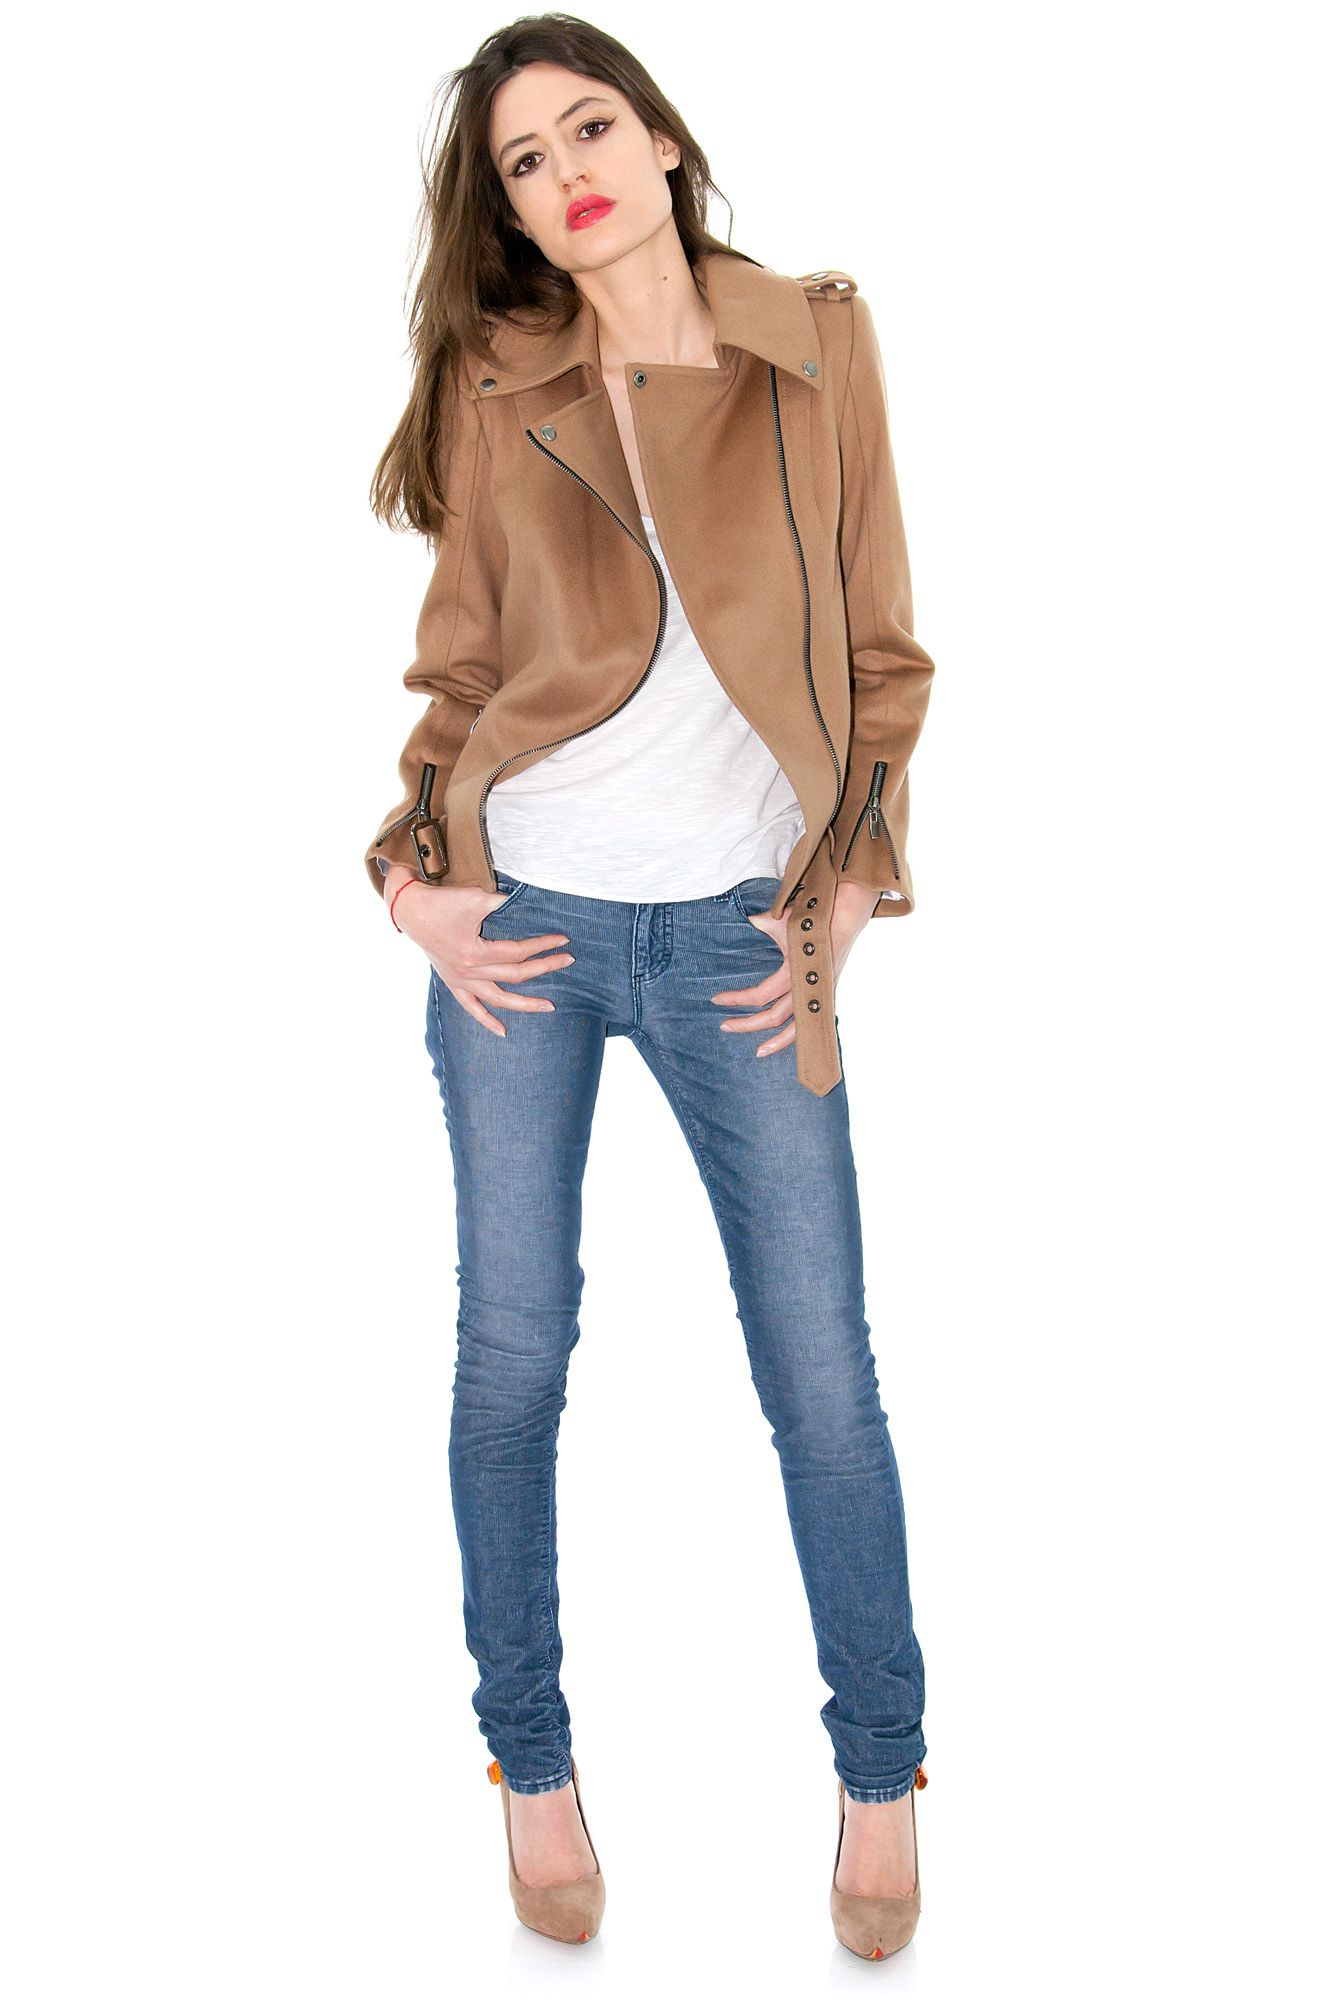 91c1a8cdb7f43 Perfecto laine, perfecto camel, blouson sexy - Stefanie Renoma ...